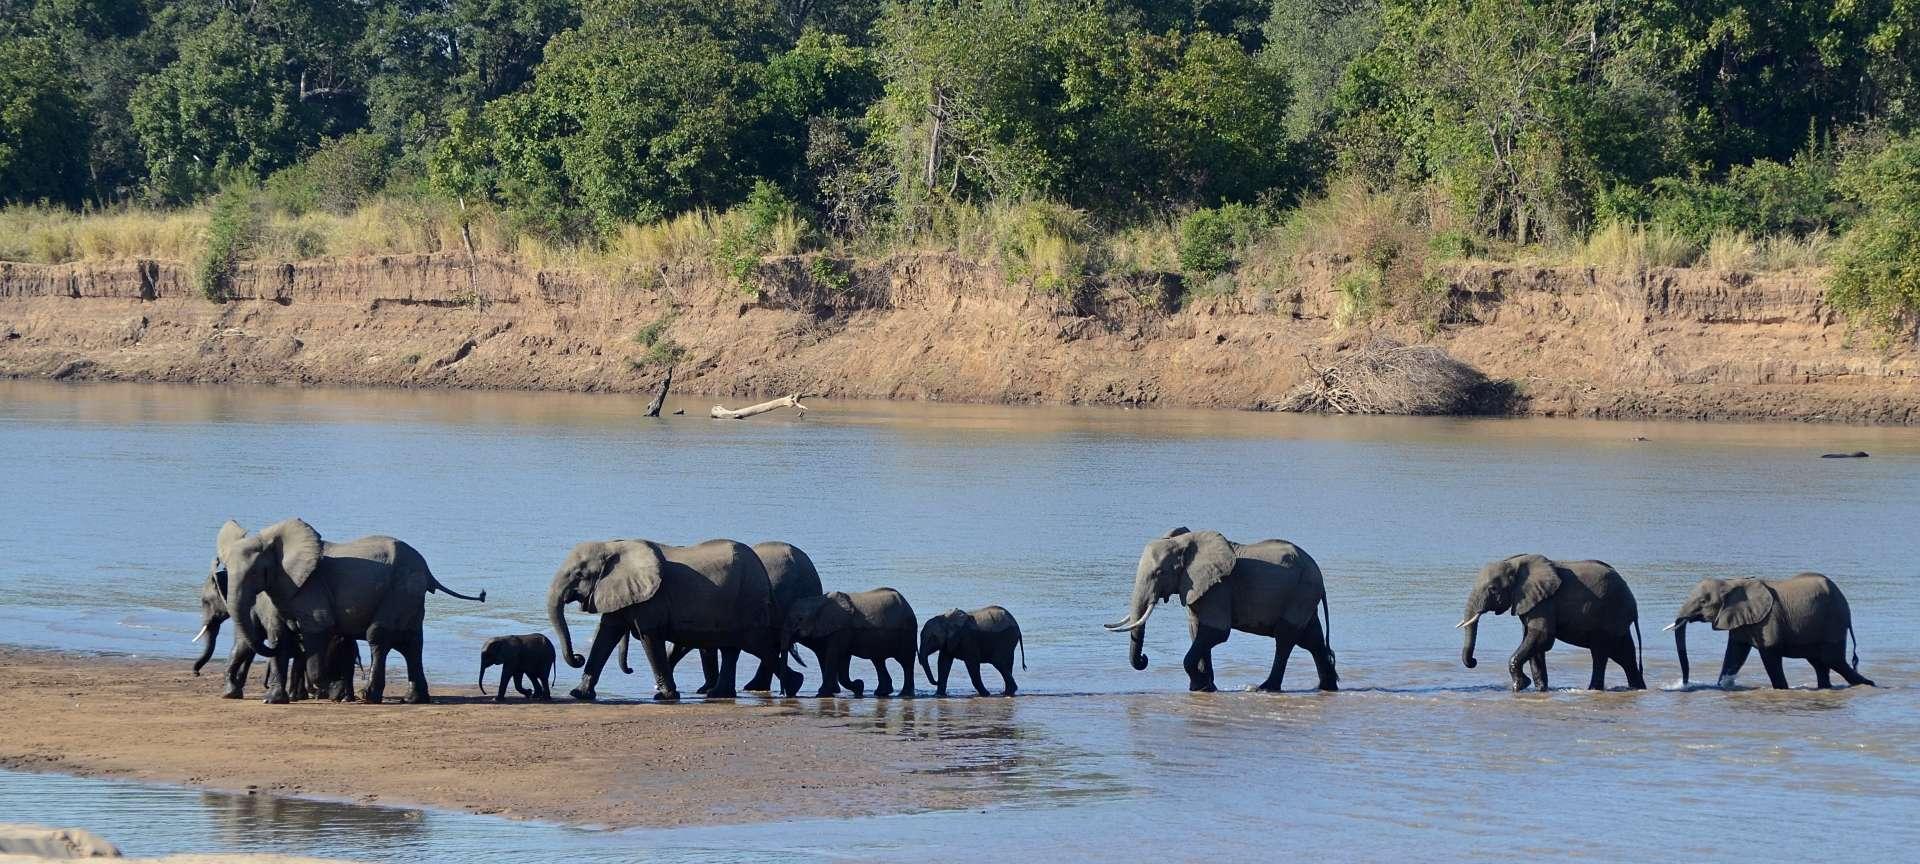 Mosi-oa-Tunya National Park - Africa Wildlife Safaris